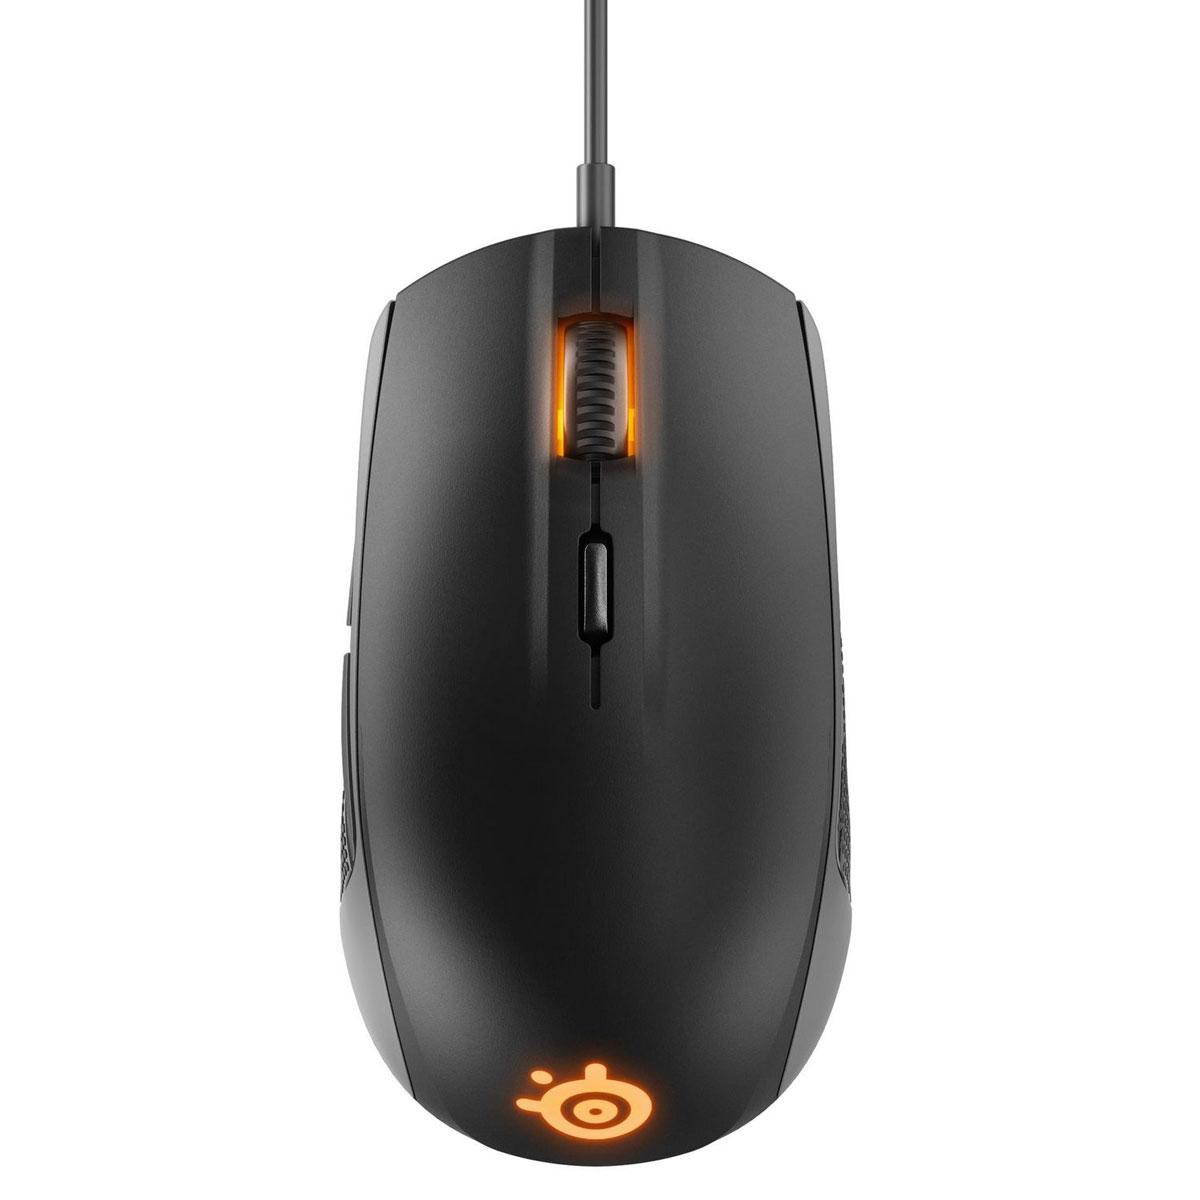 SteelSeries Rival 100 62341, Black игровая мышь race core steelseries kinzu v3 игровая мышь проводная мышь белый